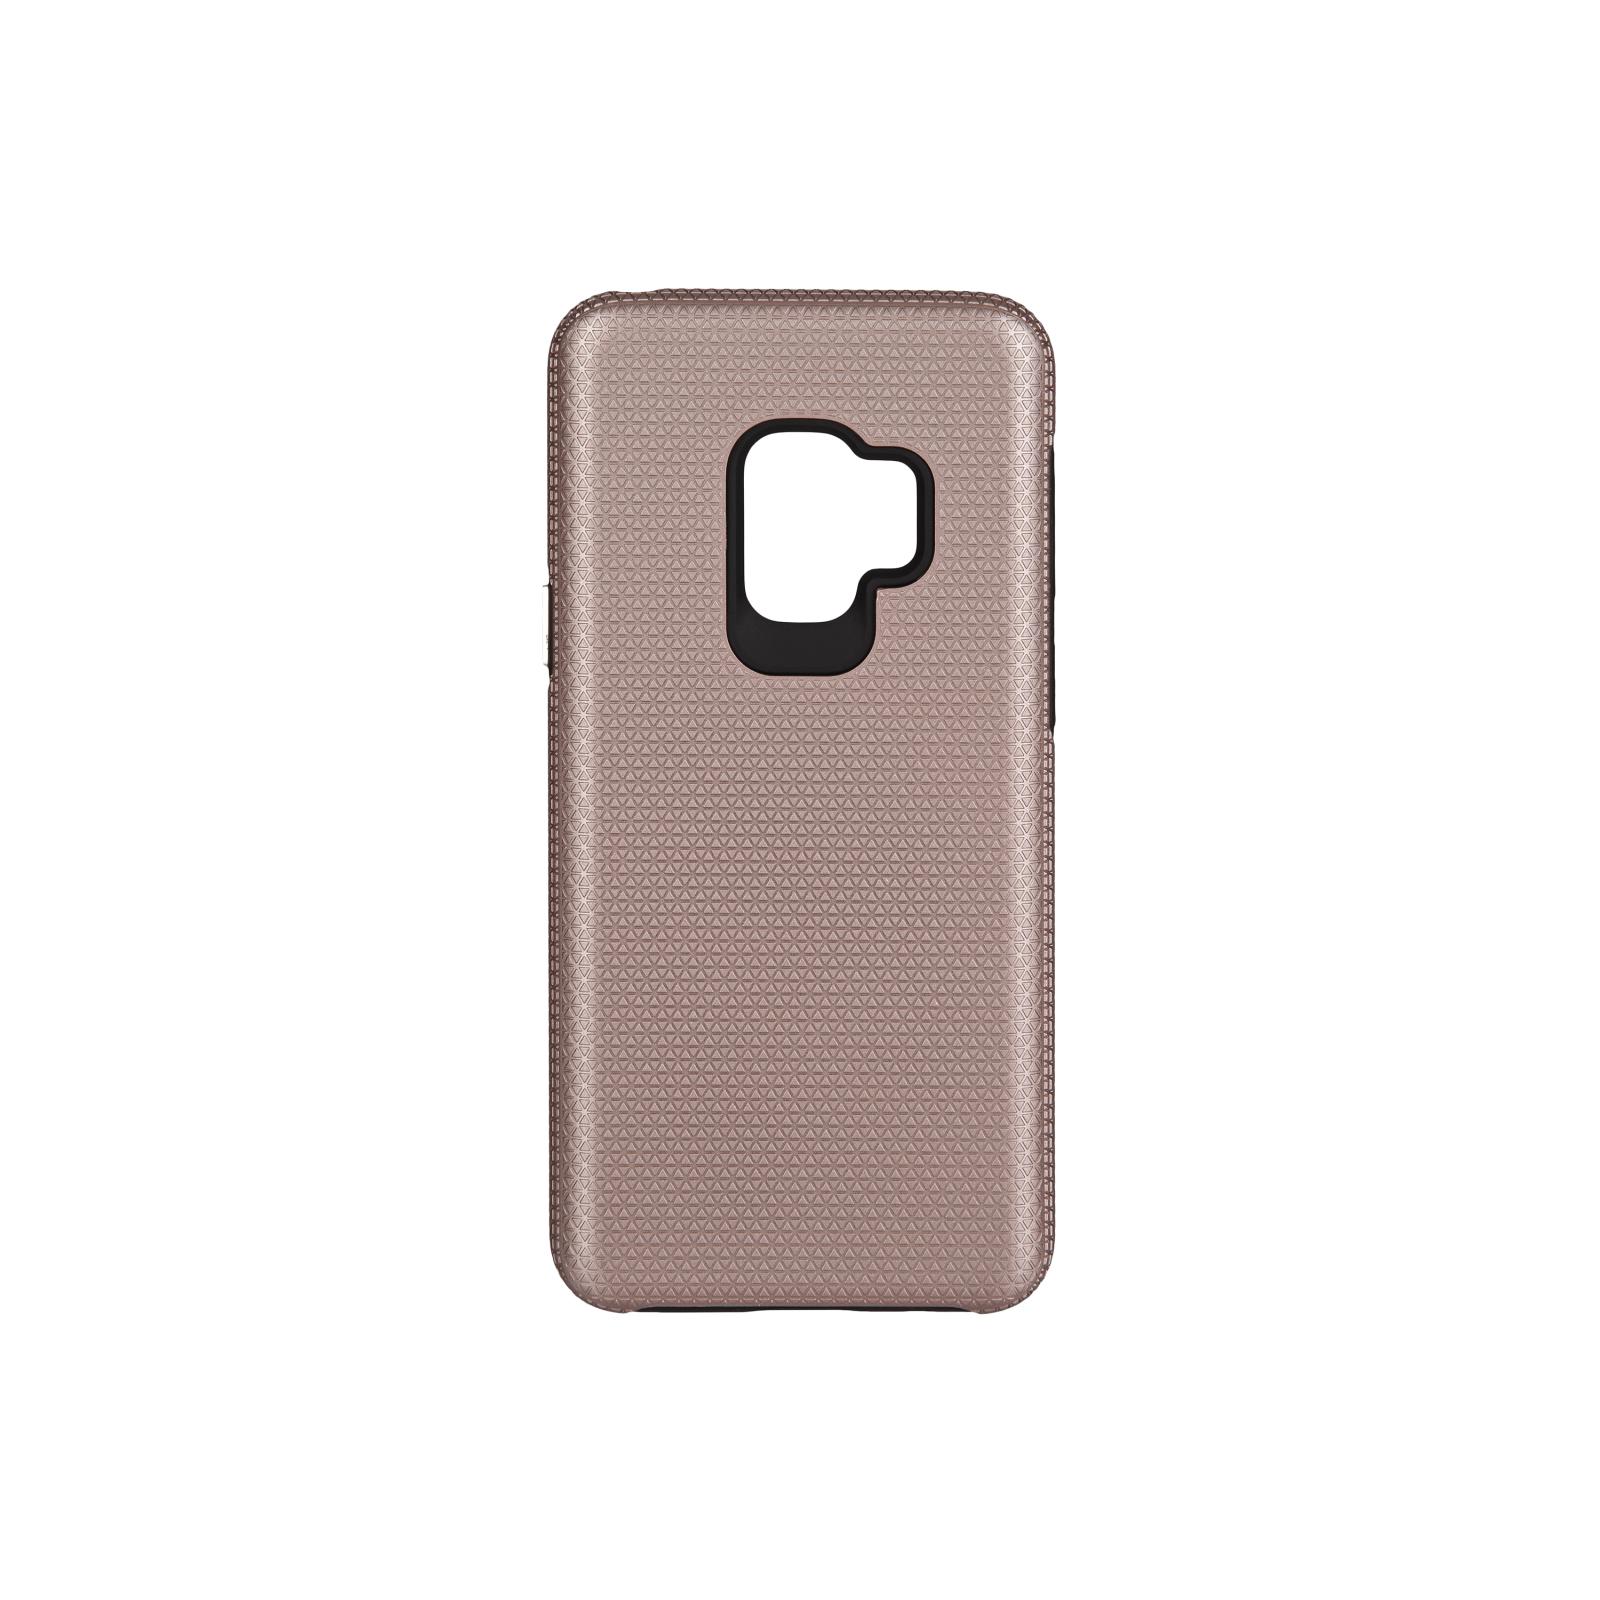 Чохол до моб. телефона 2E Samsung Galaxy S9 (G960), Triangle, Rose gold (2E-G-S9-18-TKTLRG)